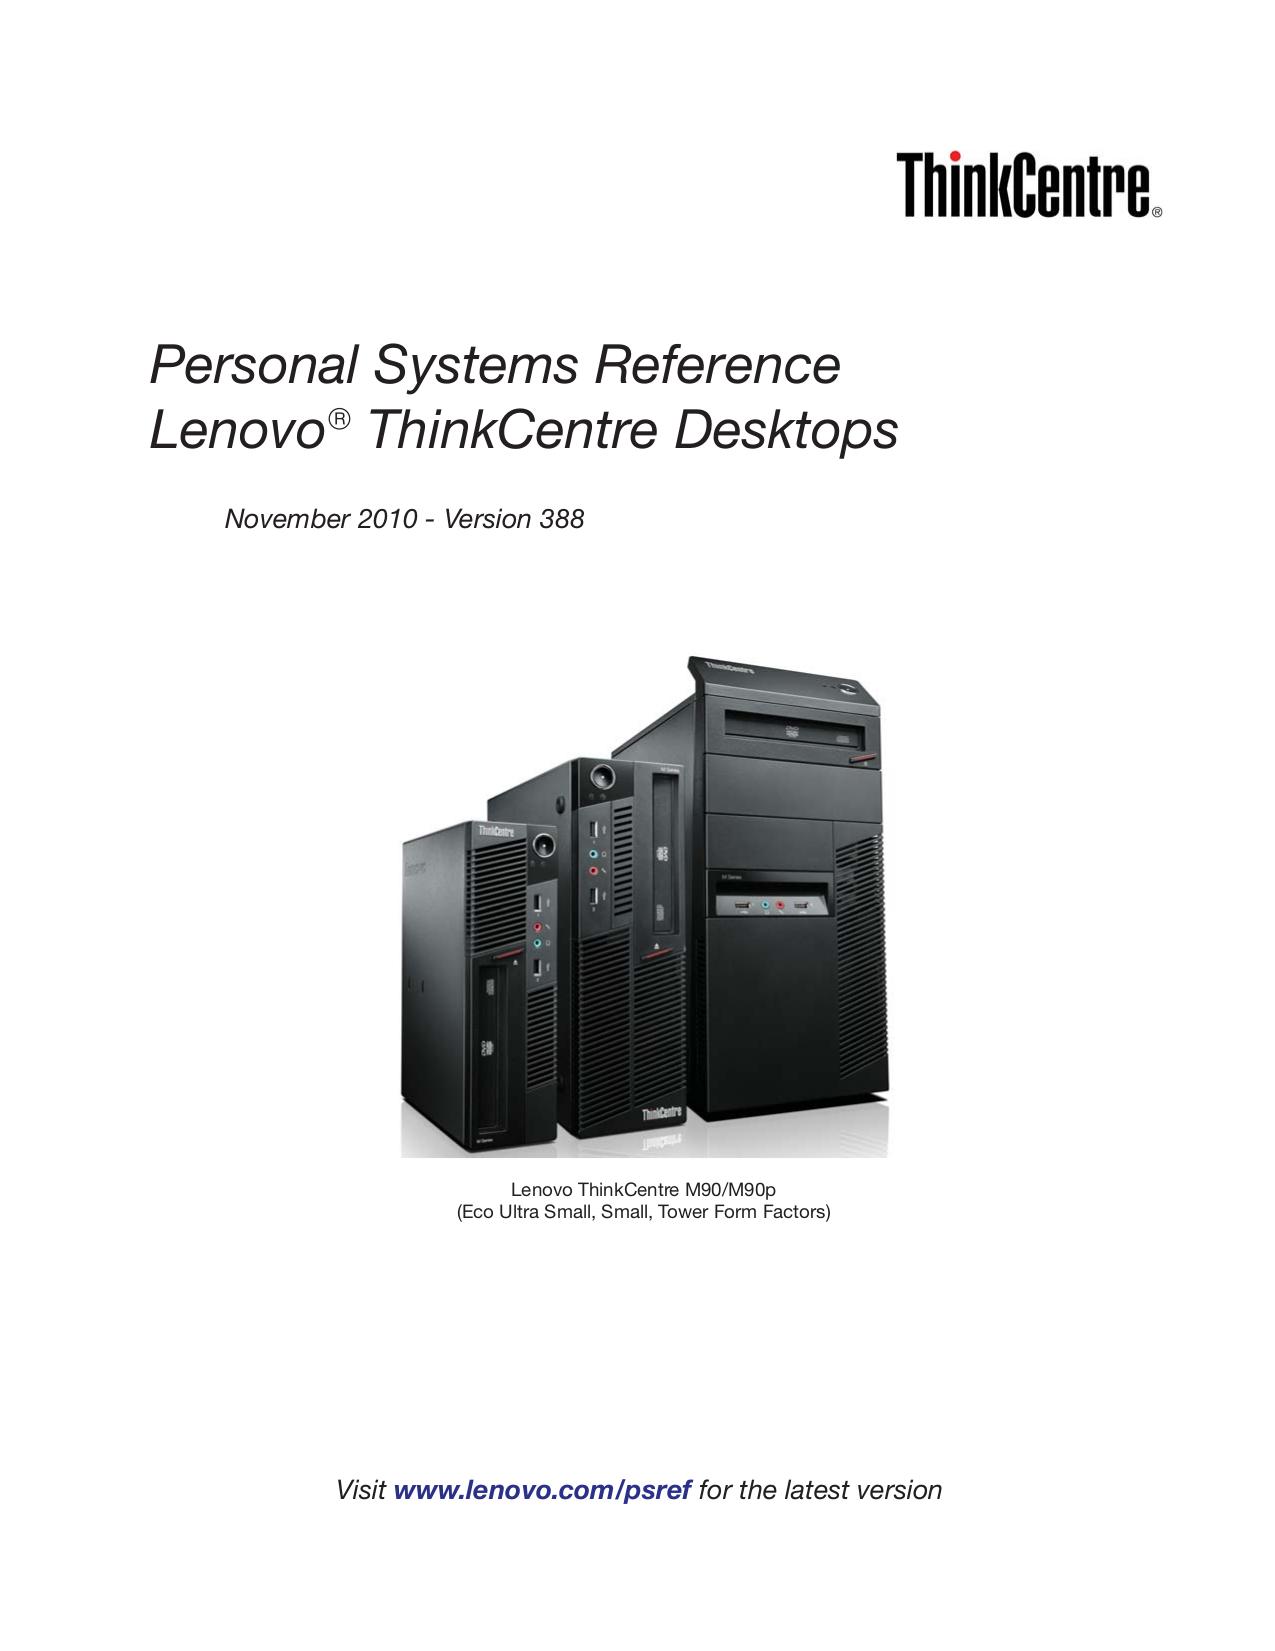 pdf for Lenovo Desktop ThinkCentre M58e 7408 manual